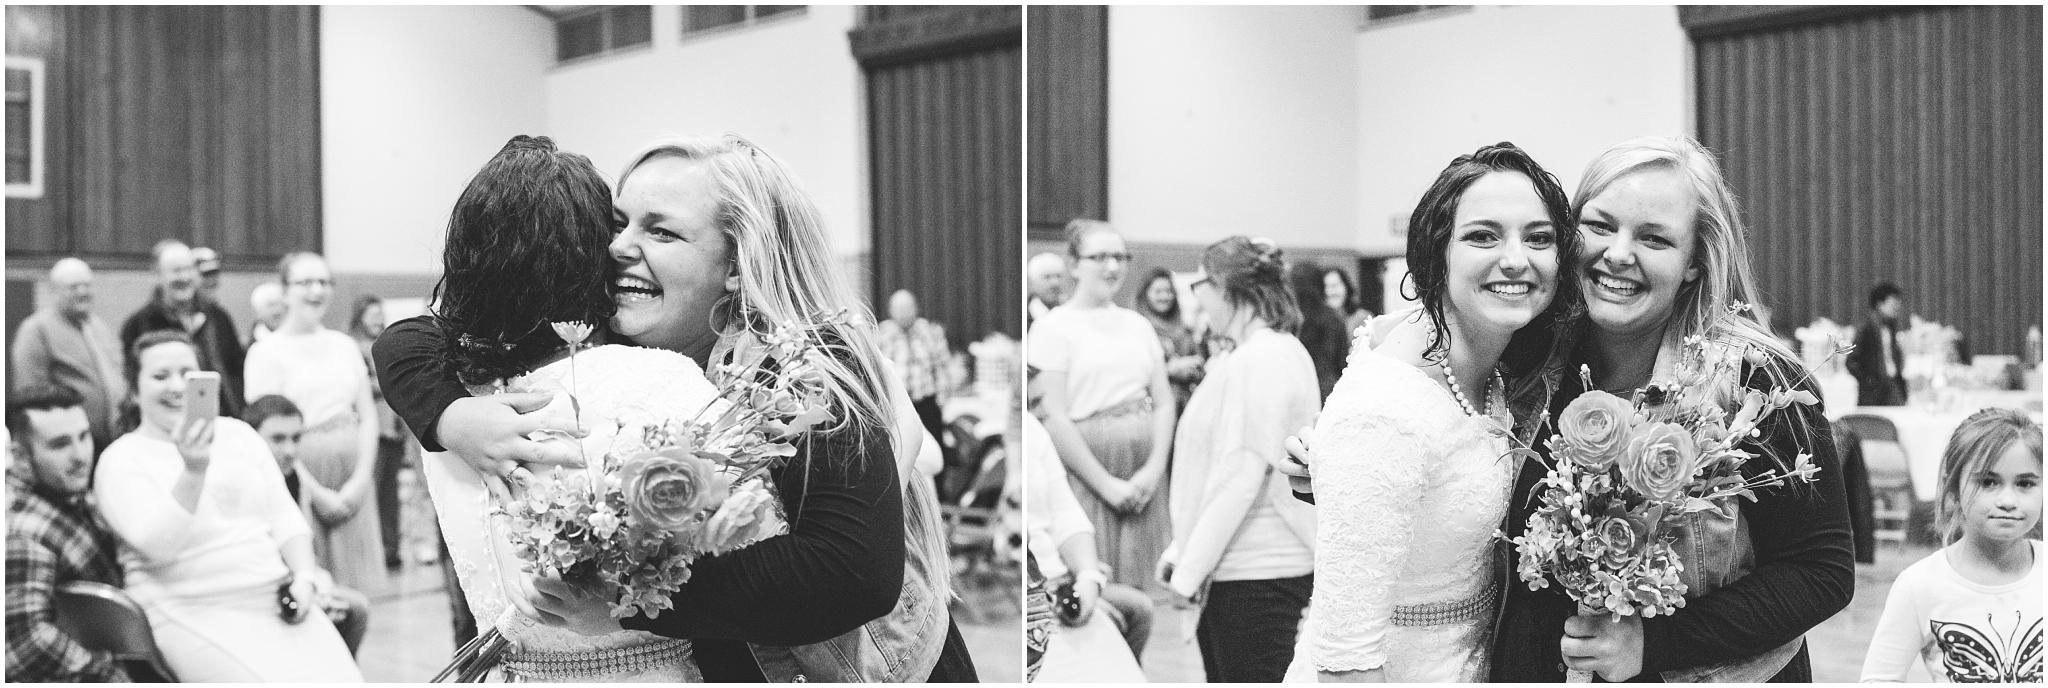 Bo Alyssa Wedding-506-BW_Lizzie-B-Imagery-Utah-Wedding-Photographer-Central-Utah-Photographer-Utah-County-Manti-Temple.jpg